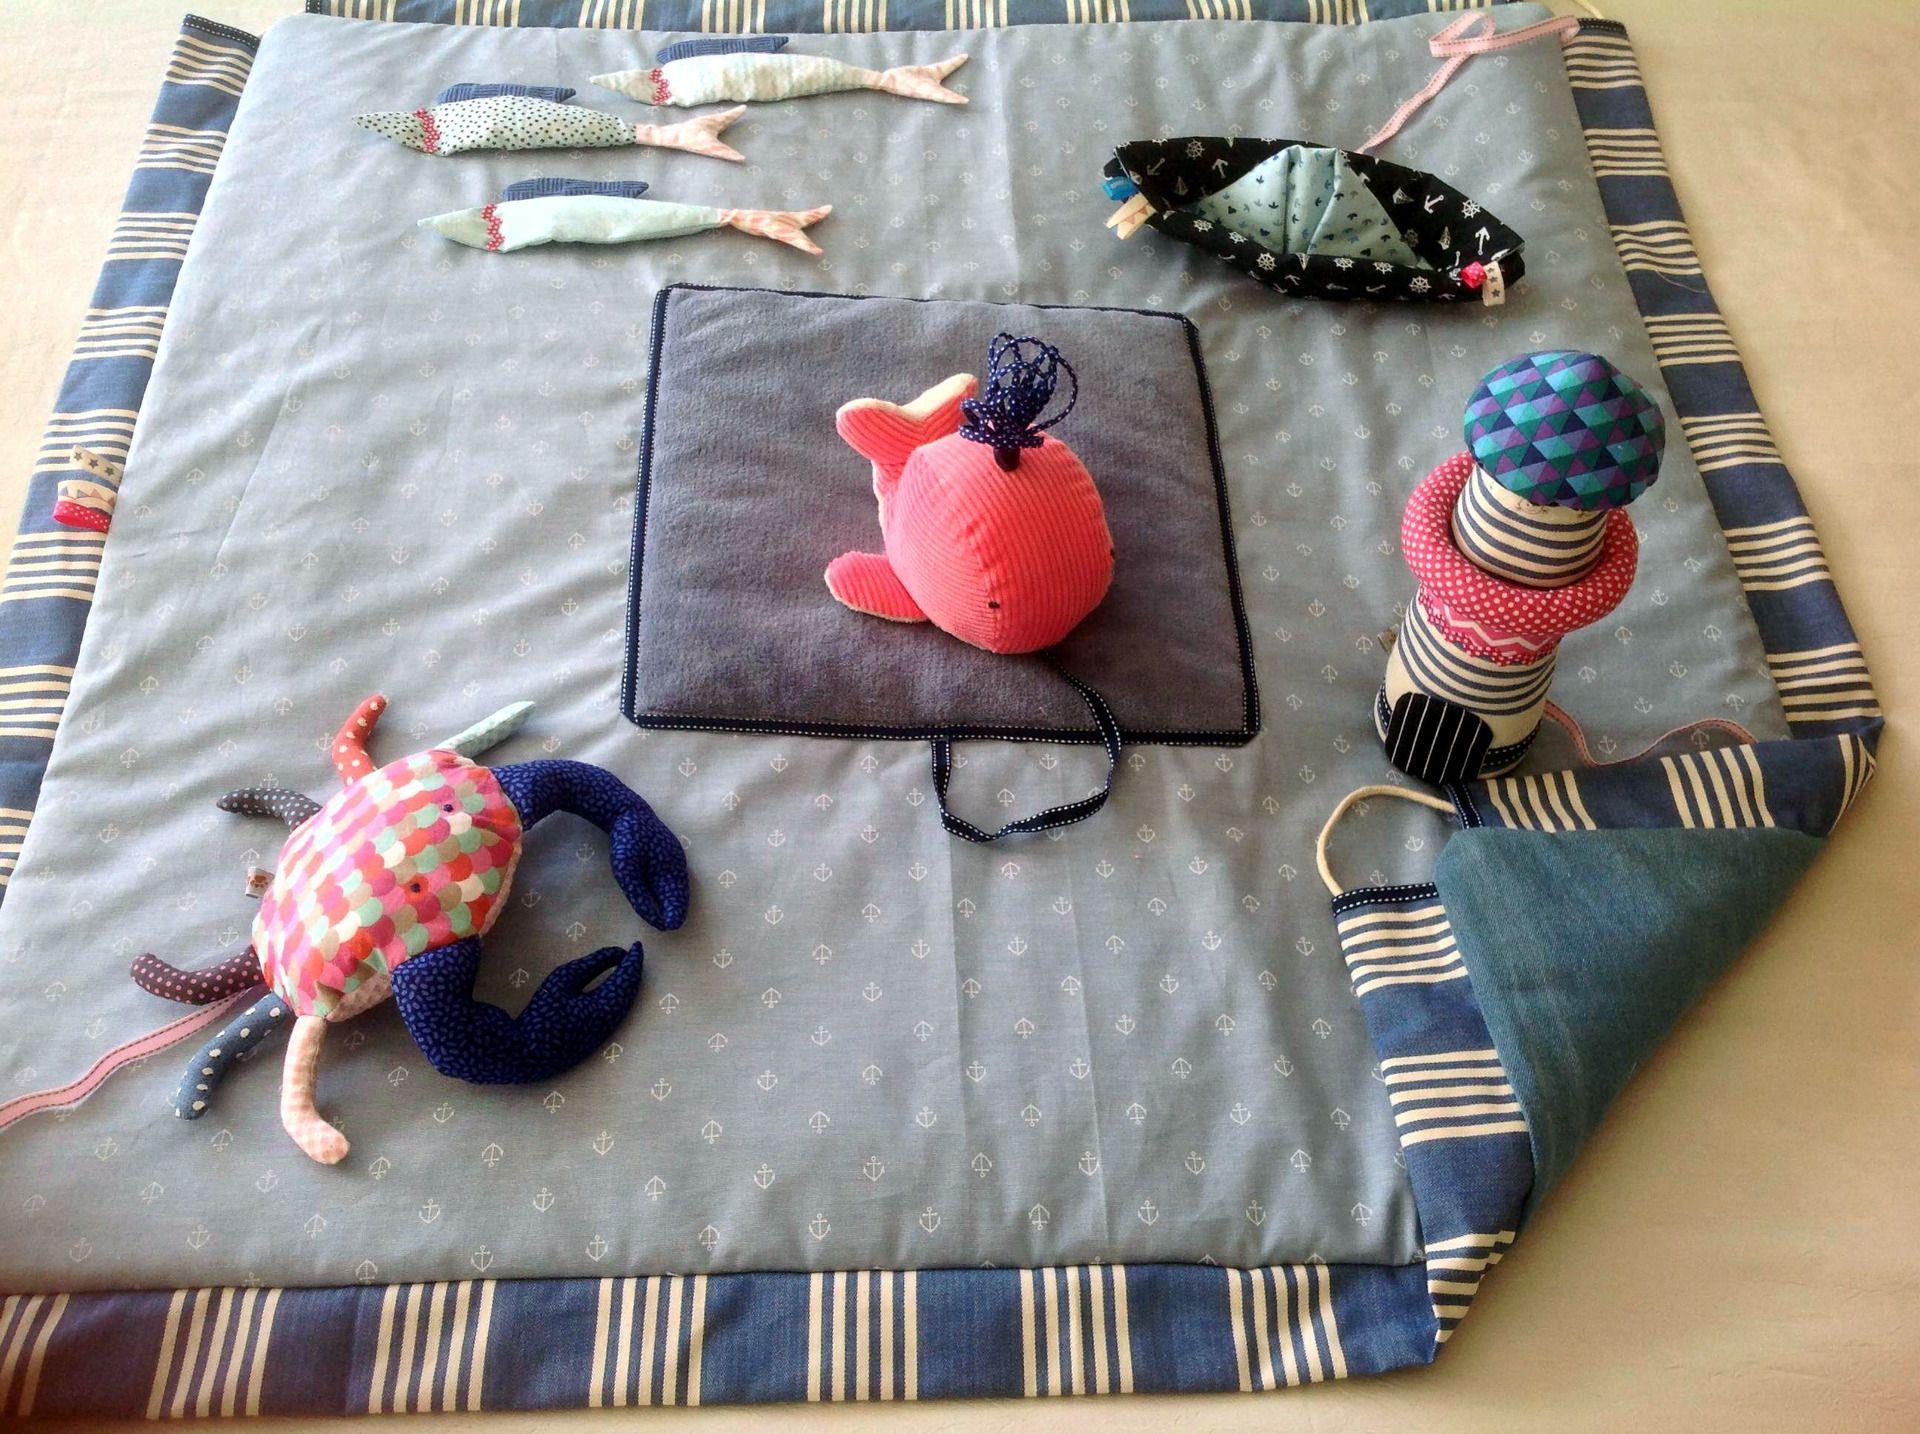 tapis d eveil sensoriel transformable